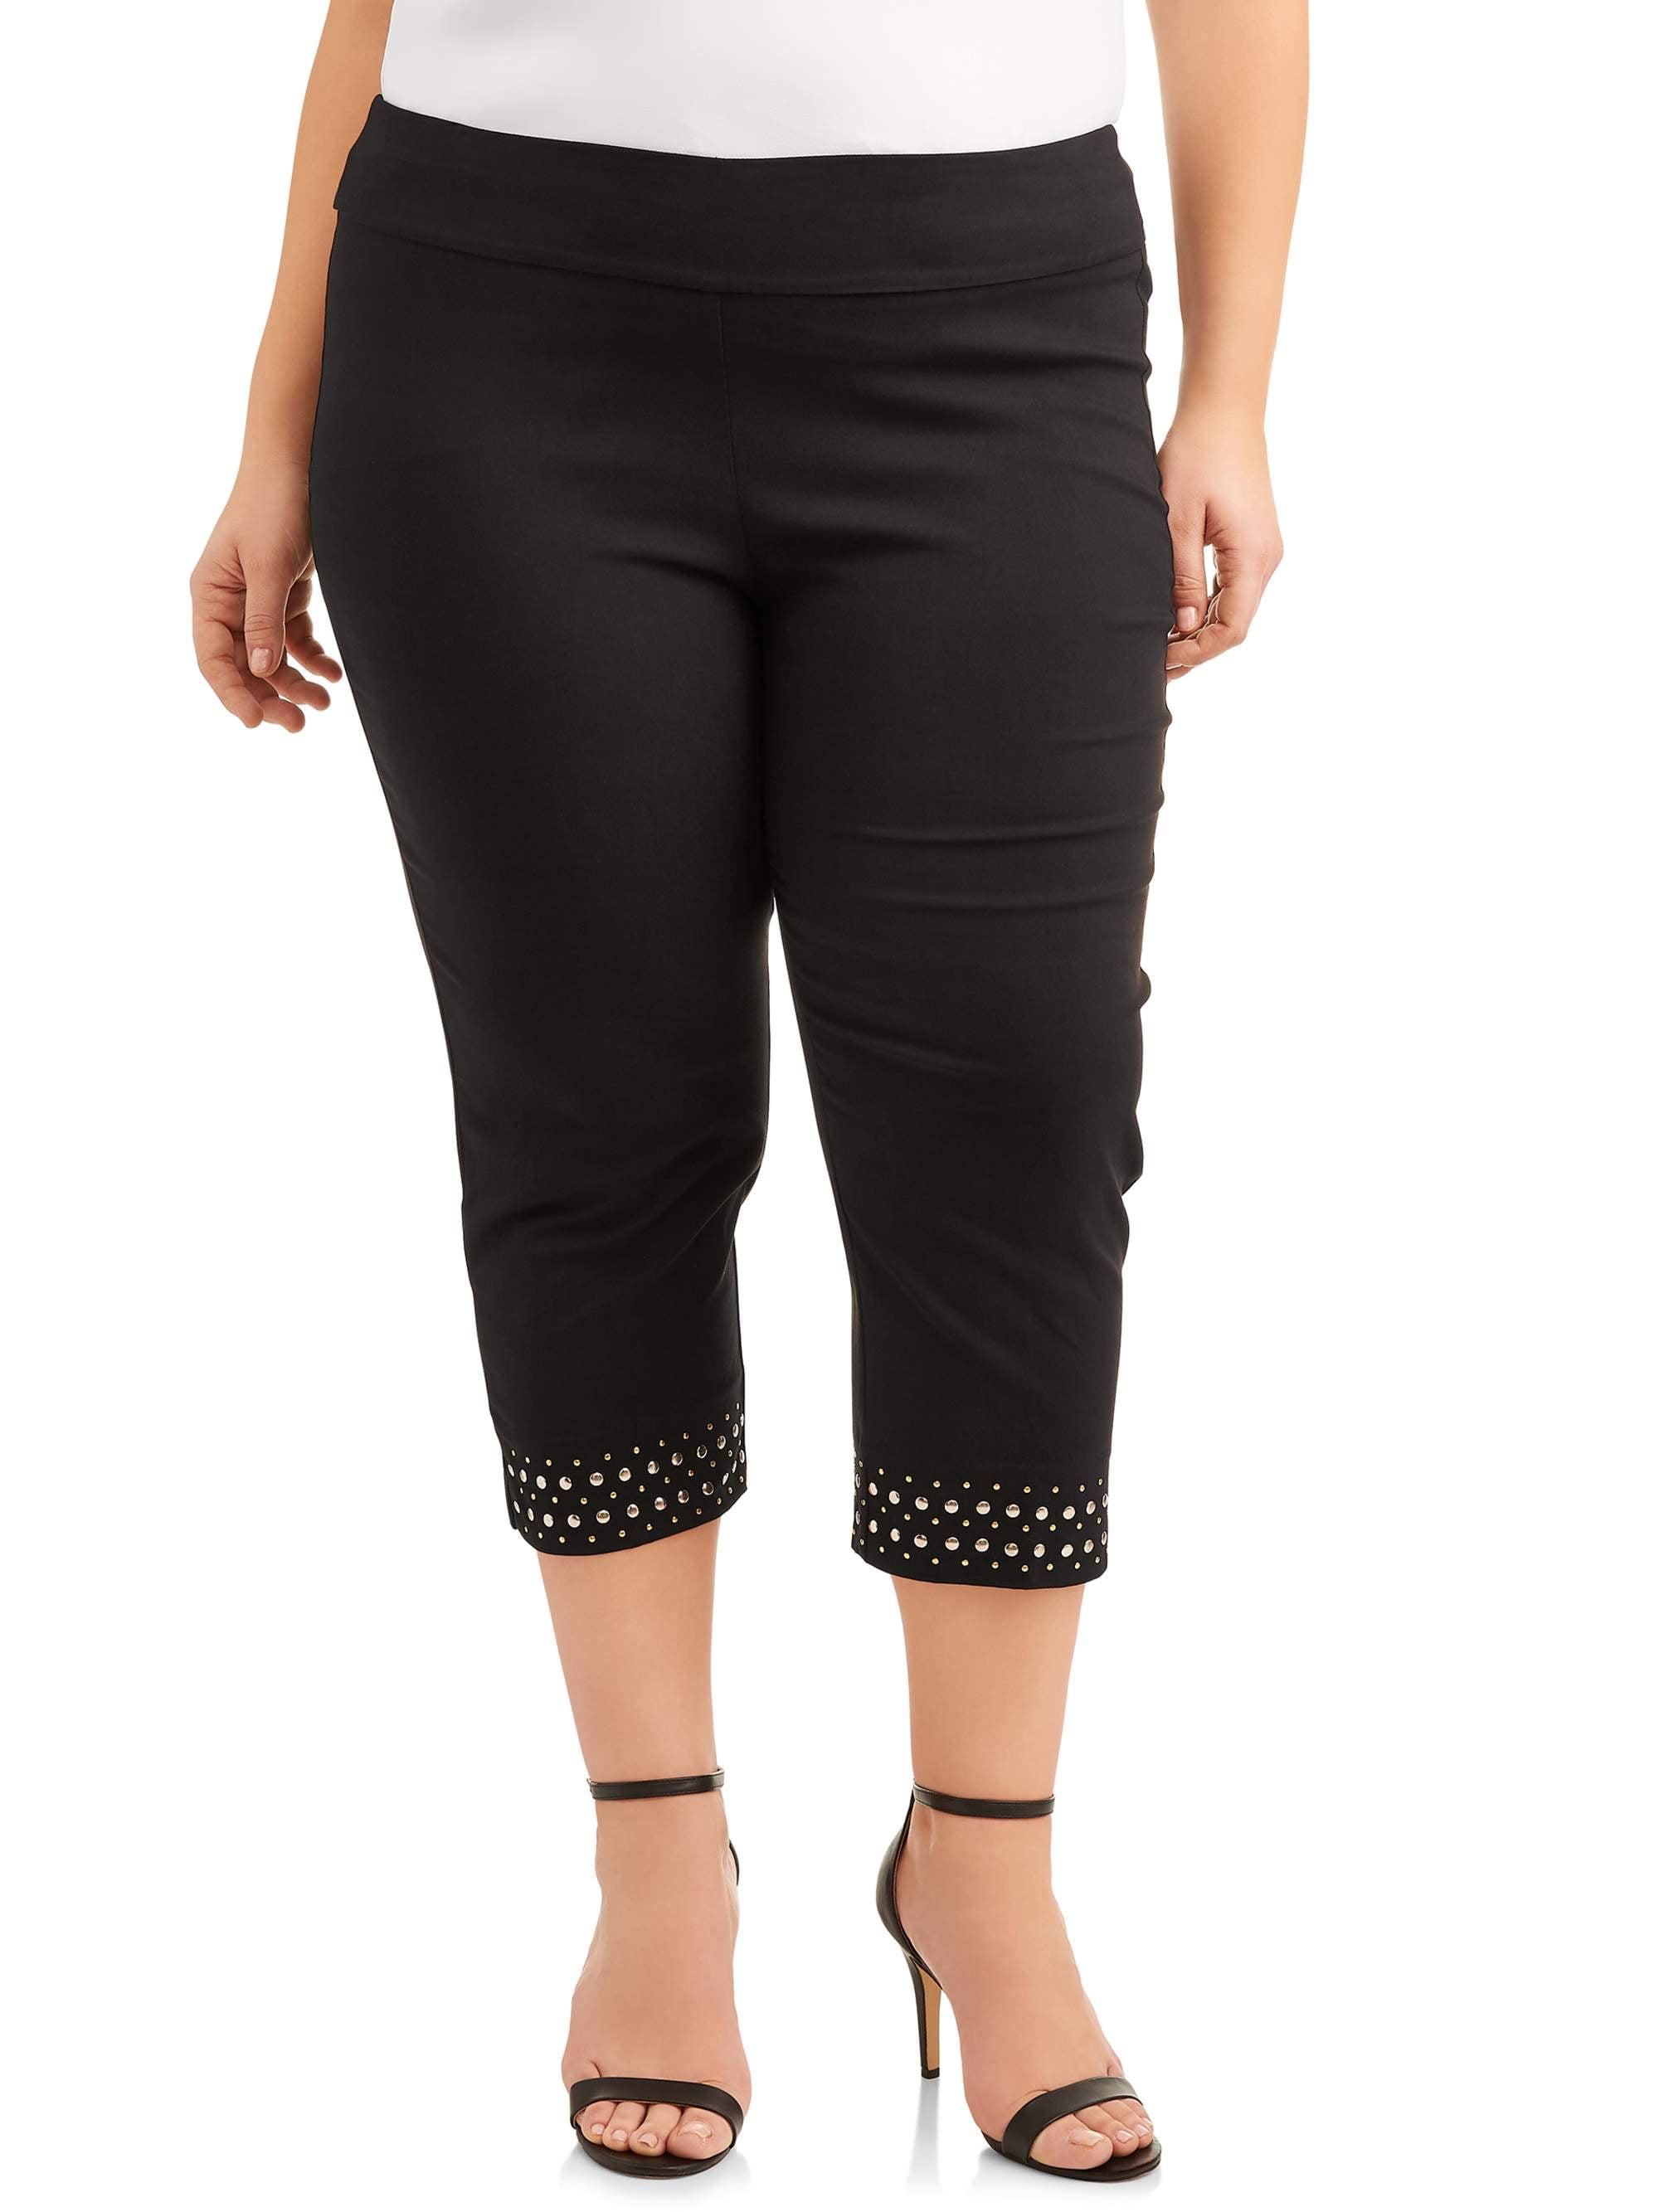 Women's Plus Size Stretch Woven Crop with Grommet Trim Pant